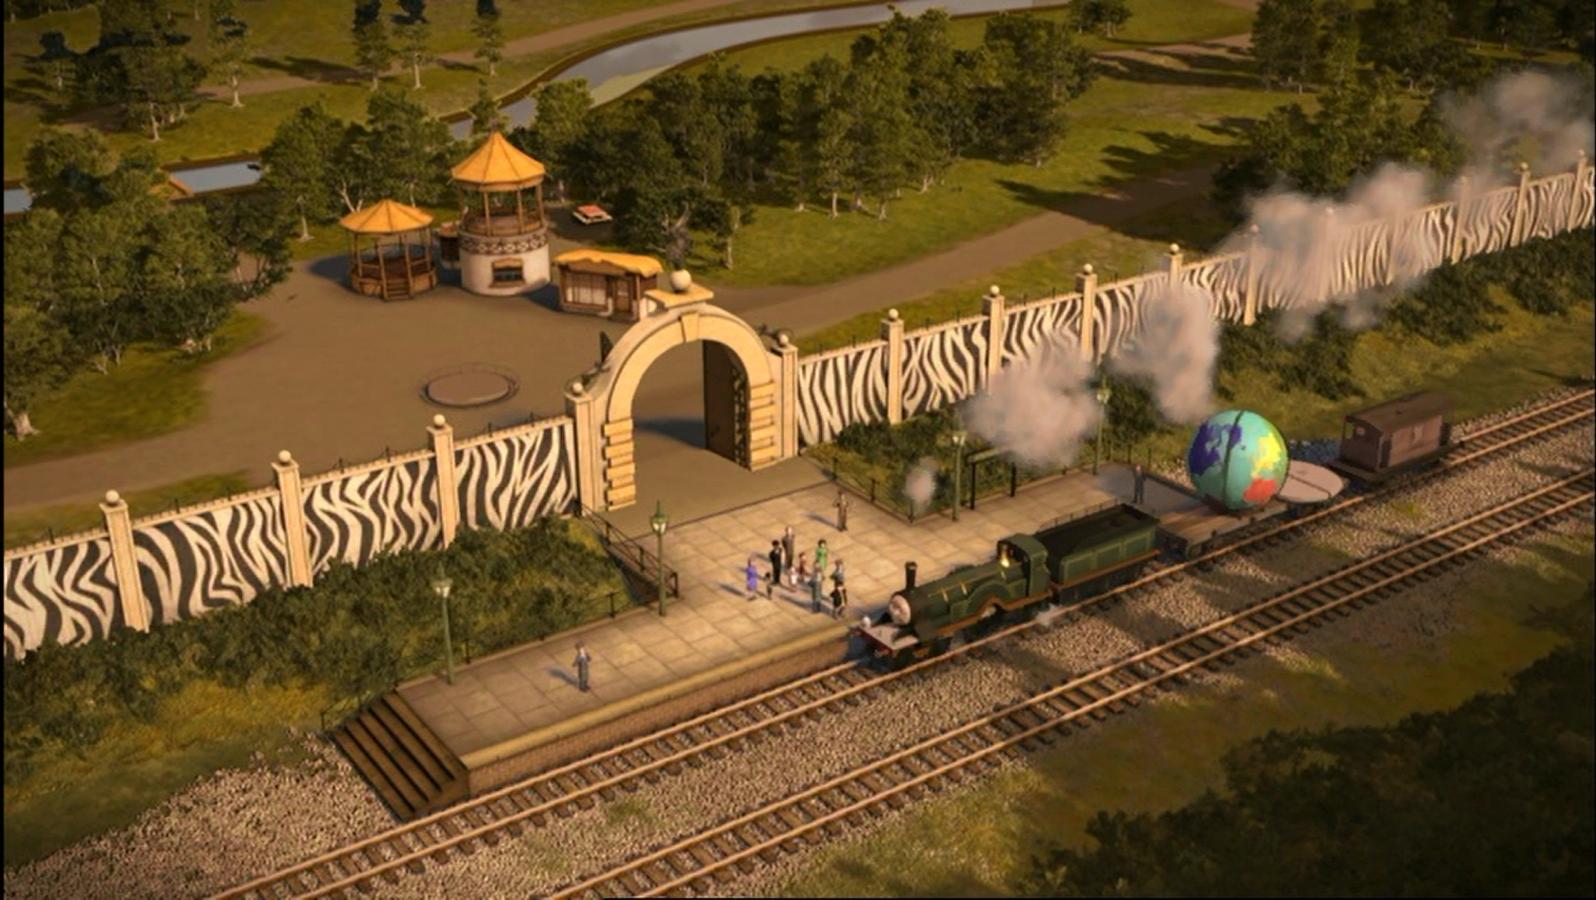 Sodor Animal Park